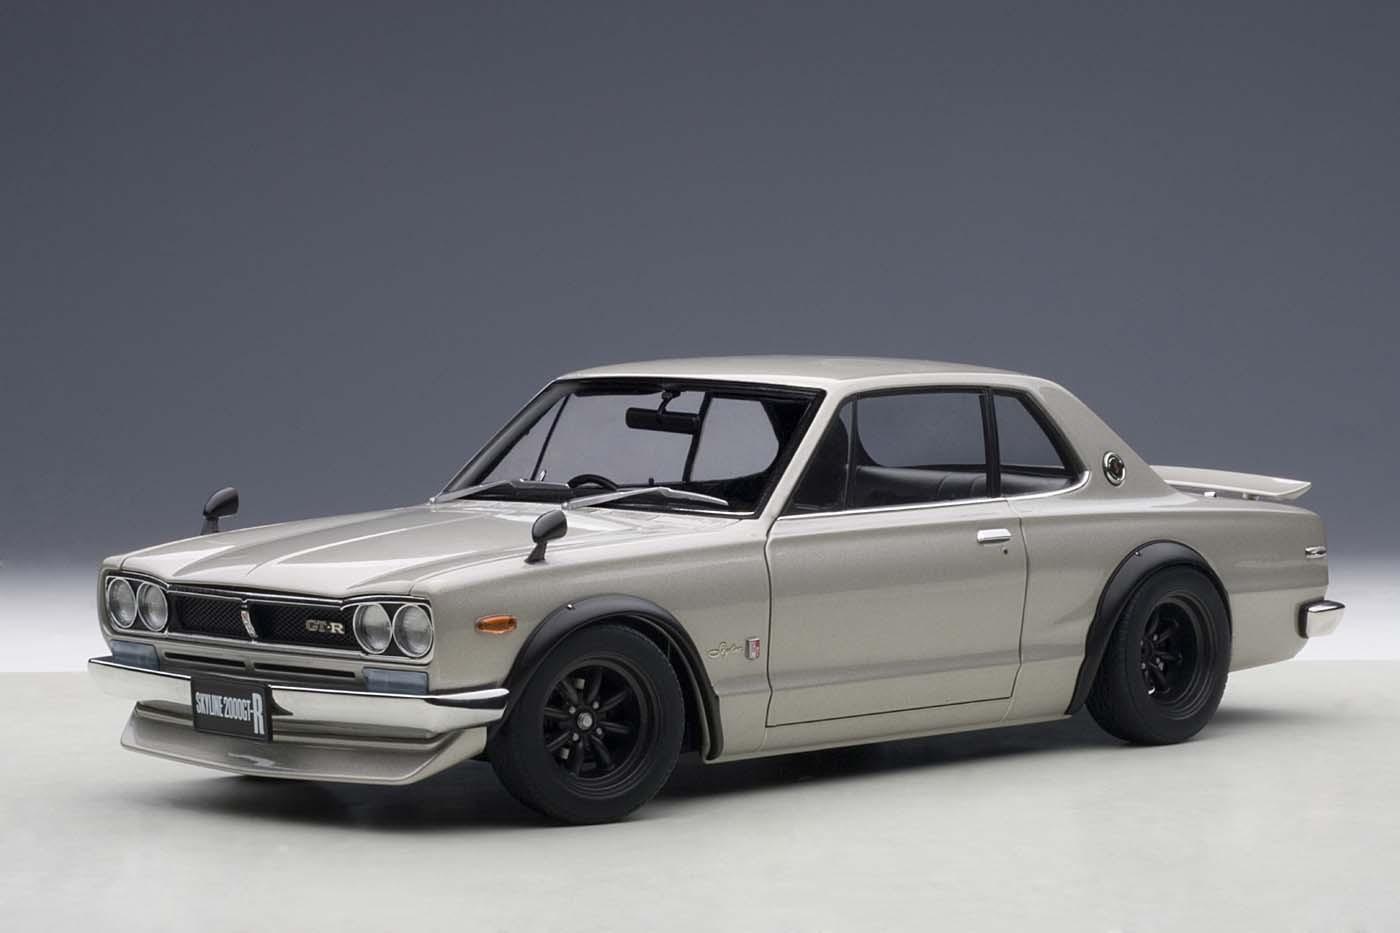 Autoart Highly Detailed Die Cast Model Nissan Skyline Gt R